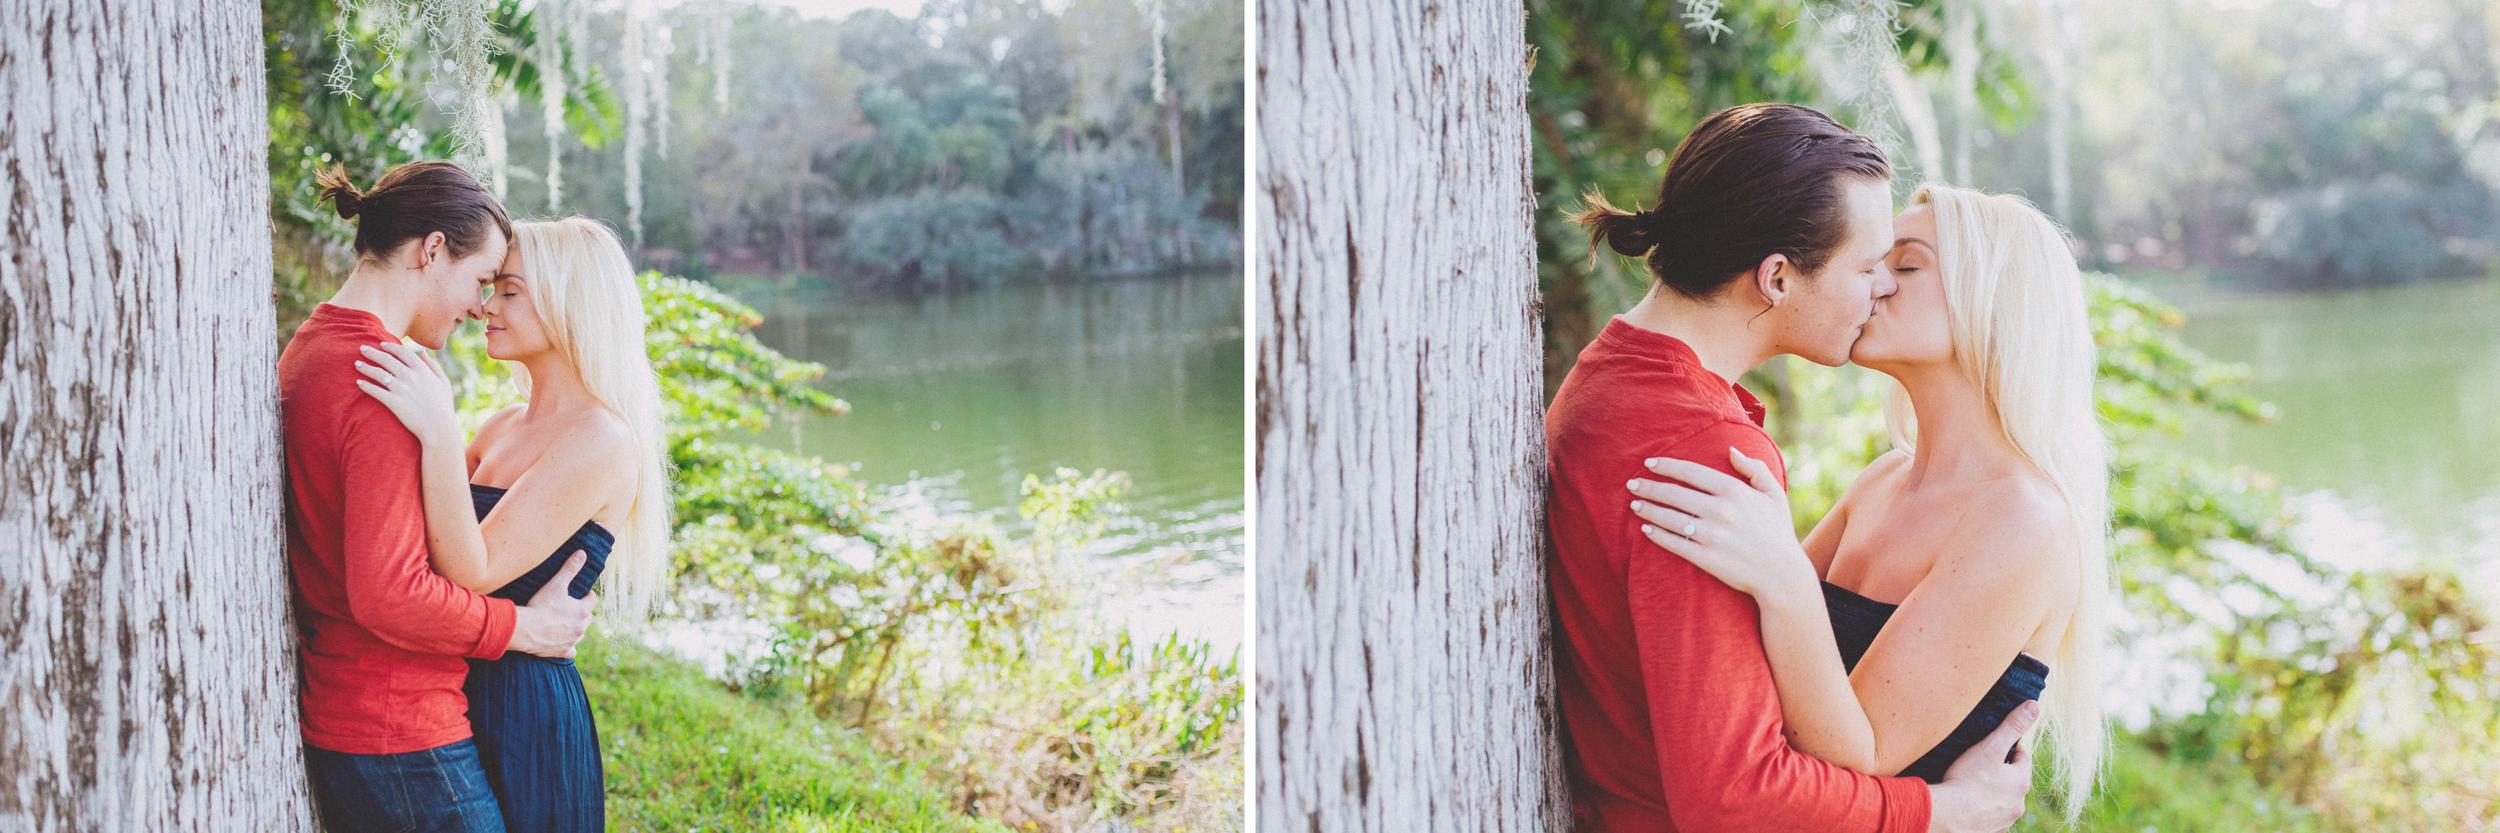 Jake + Milena: Leu Gardens Proposal // www.kristalajara.com